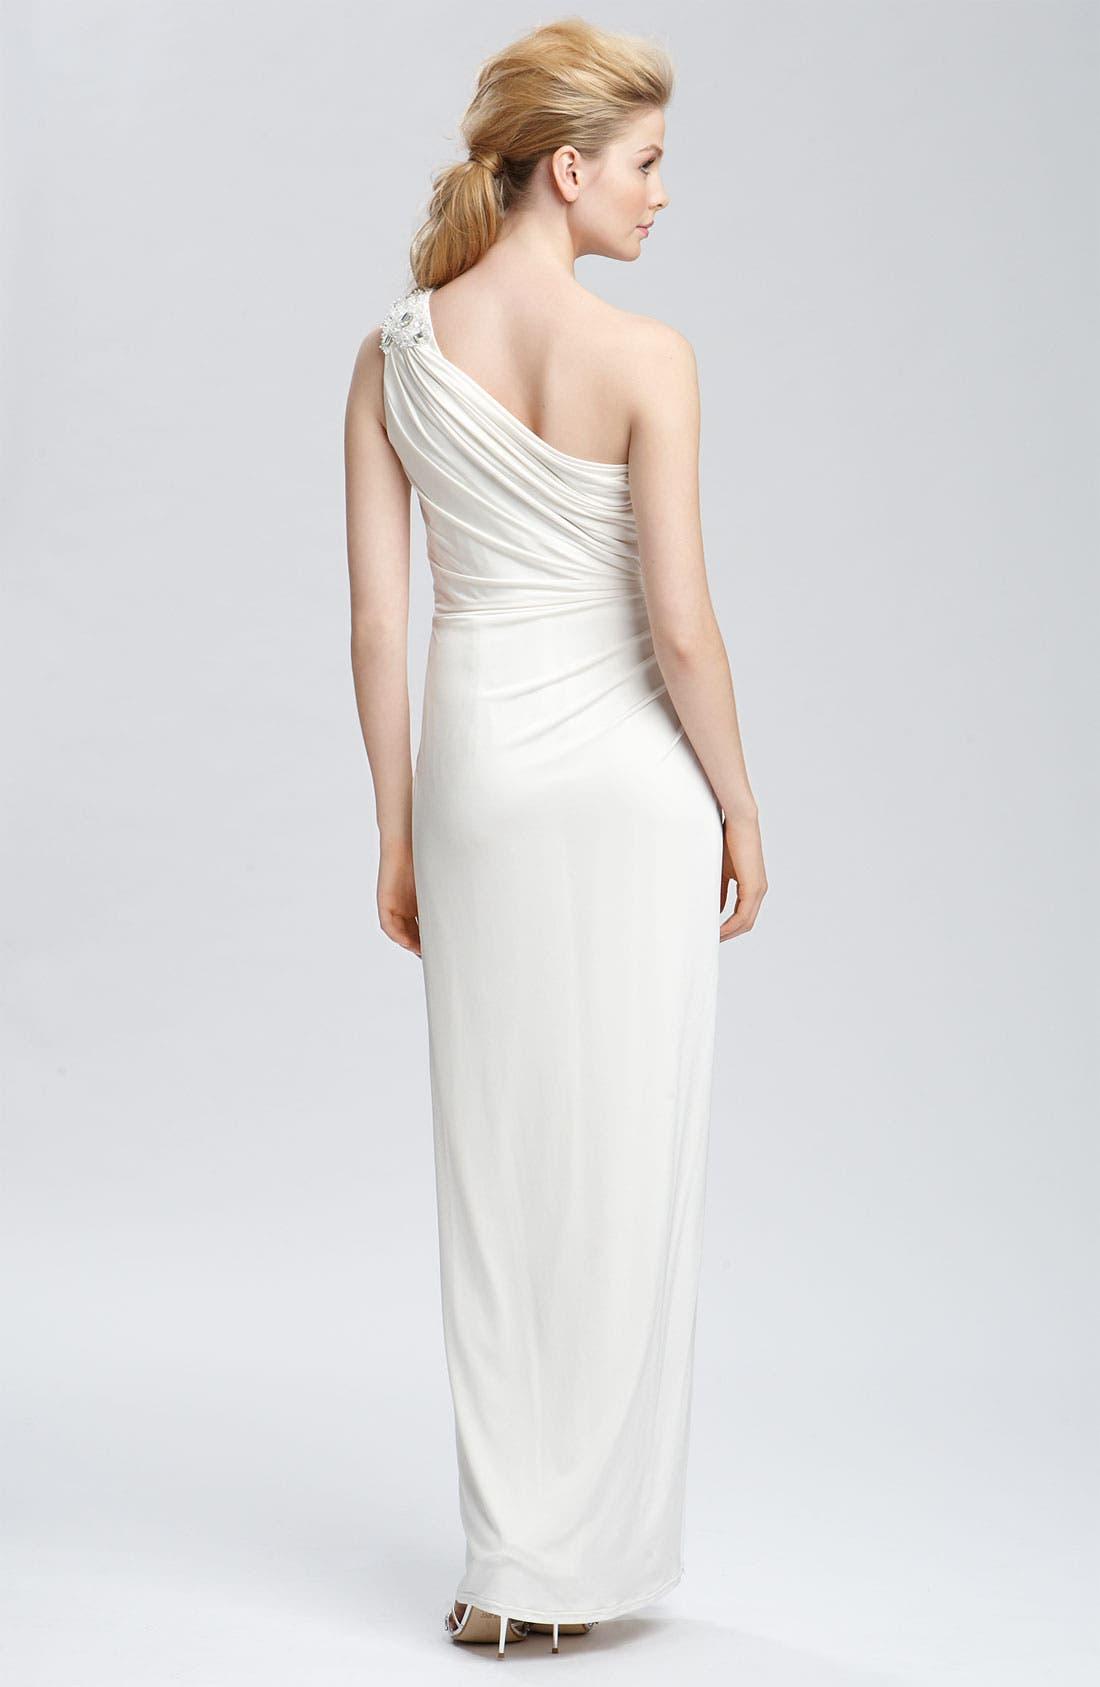 TADASHI SHOJI, Beaded Jersey One Shoulder Gown, Alternate thumbnail 3, color, 900